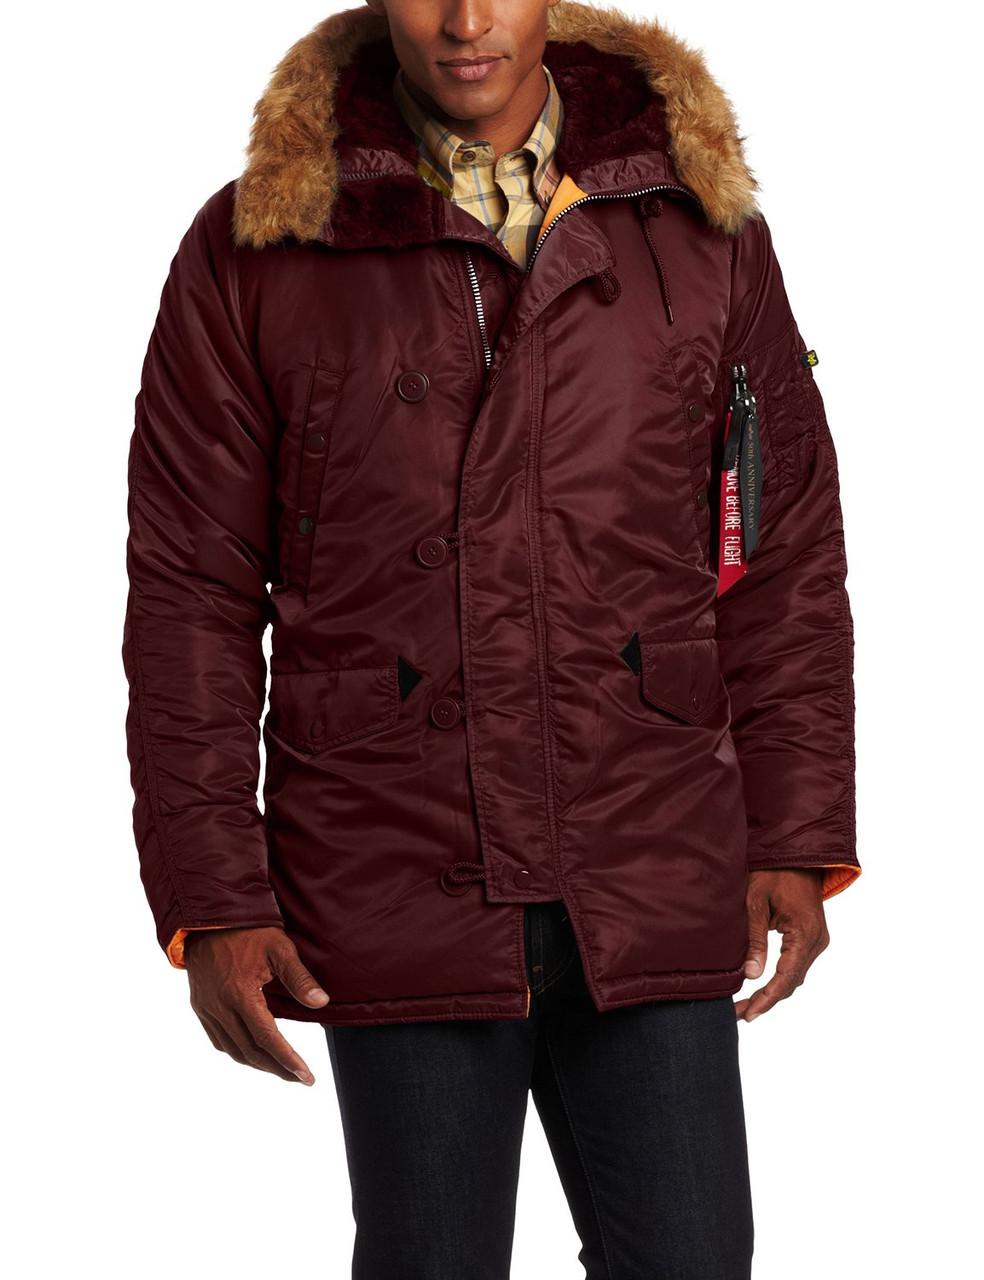 df6eb7d2 Куртка Alpha Slim Fit N-3B Parka Maroon/Orange интернет магазин одежды